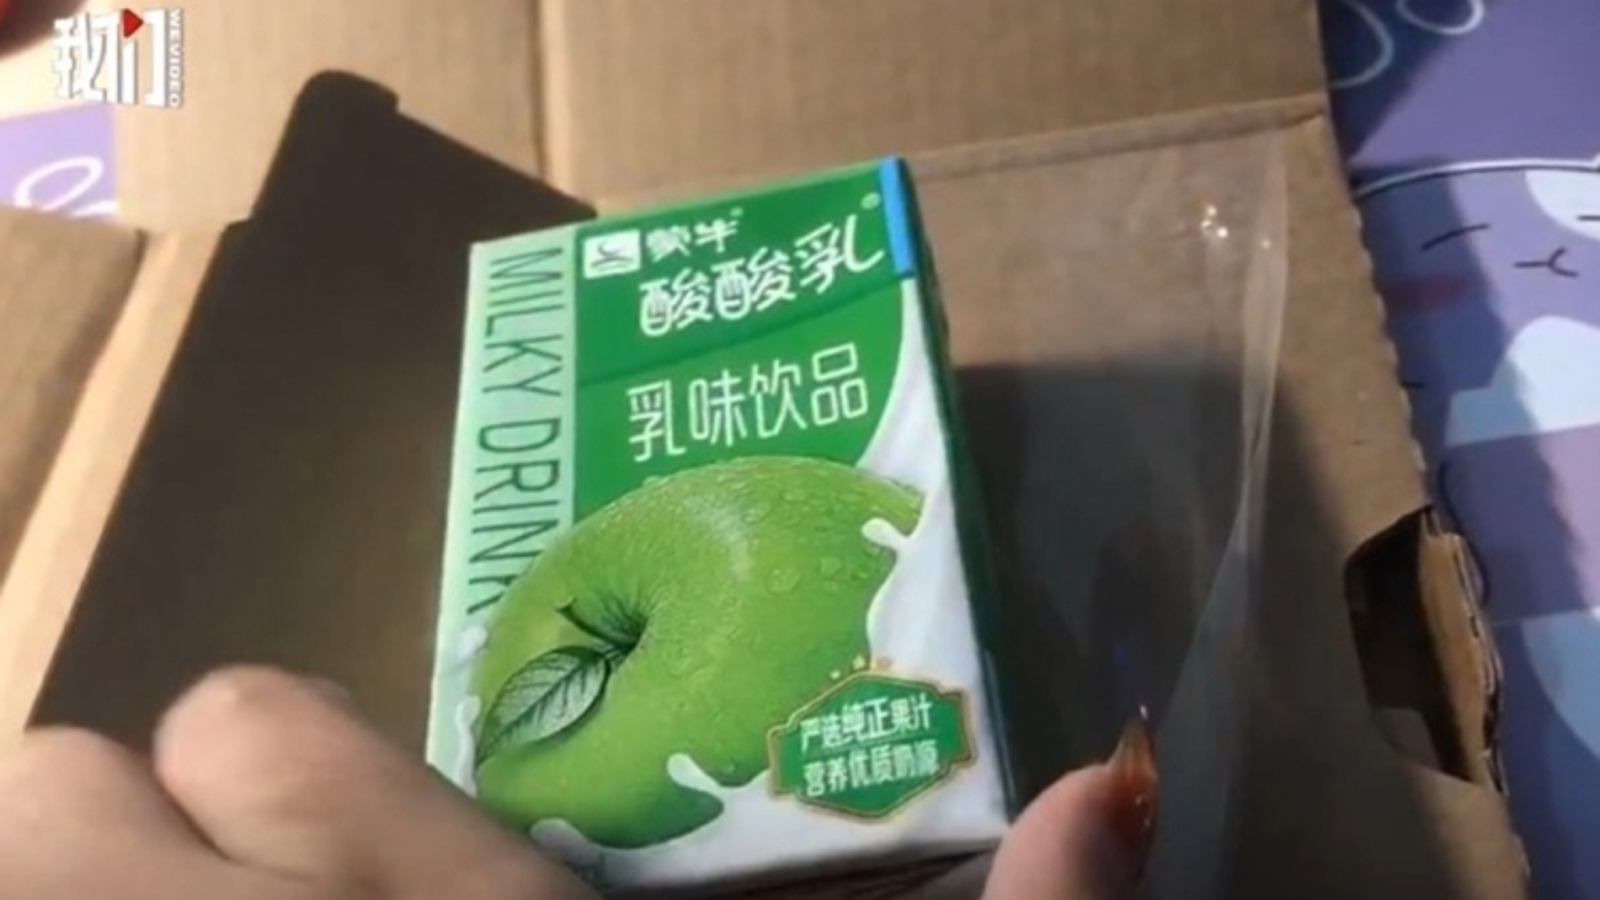 Mua iPhone 12 Pro Max trị giá 1.500 USD, nhận hộp sữa chua